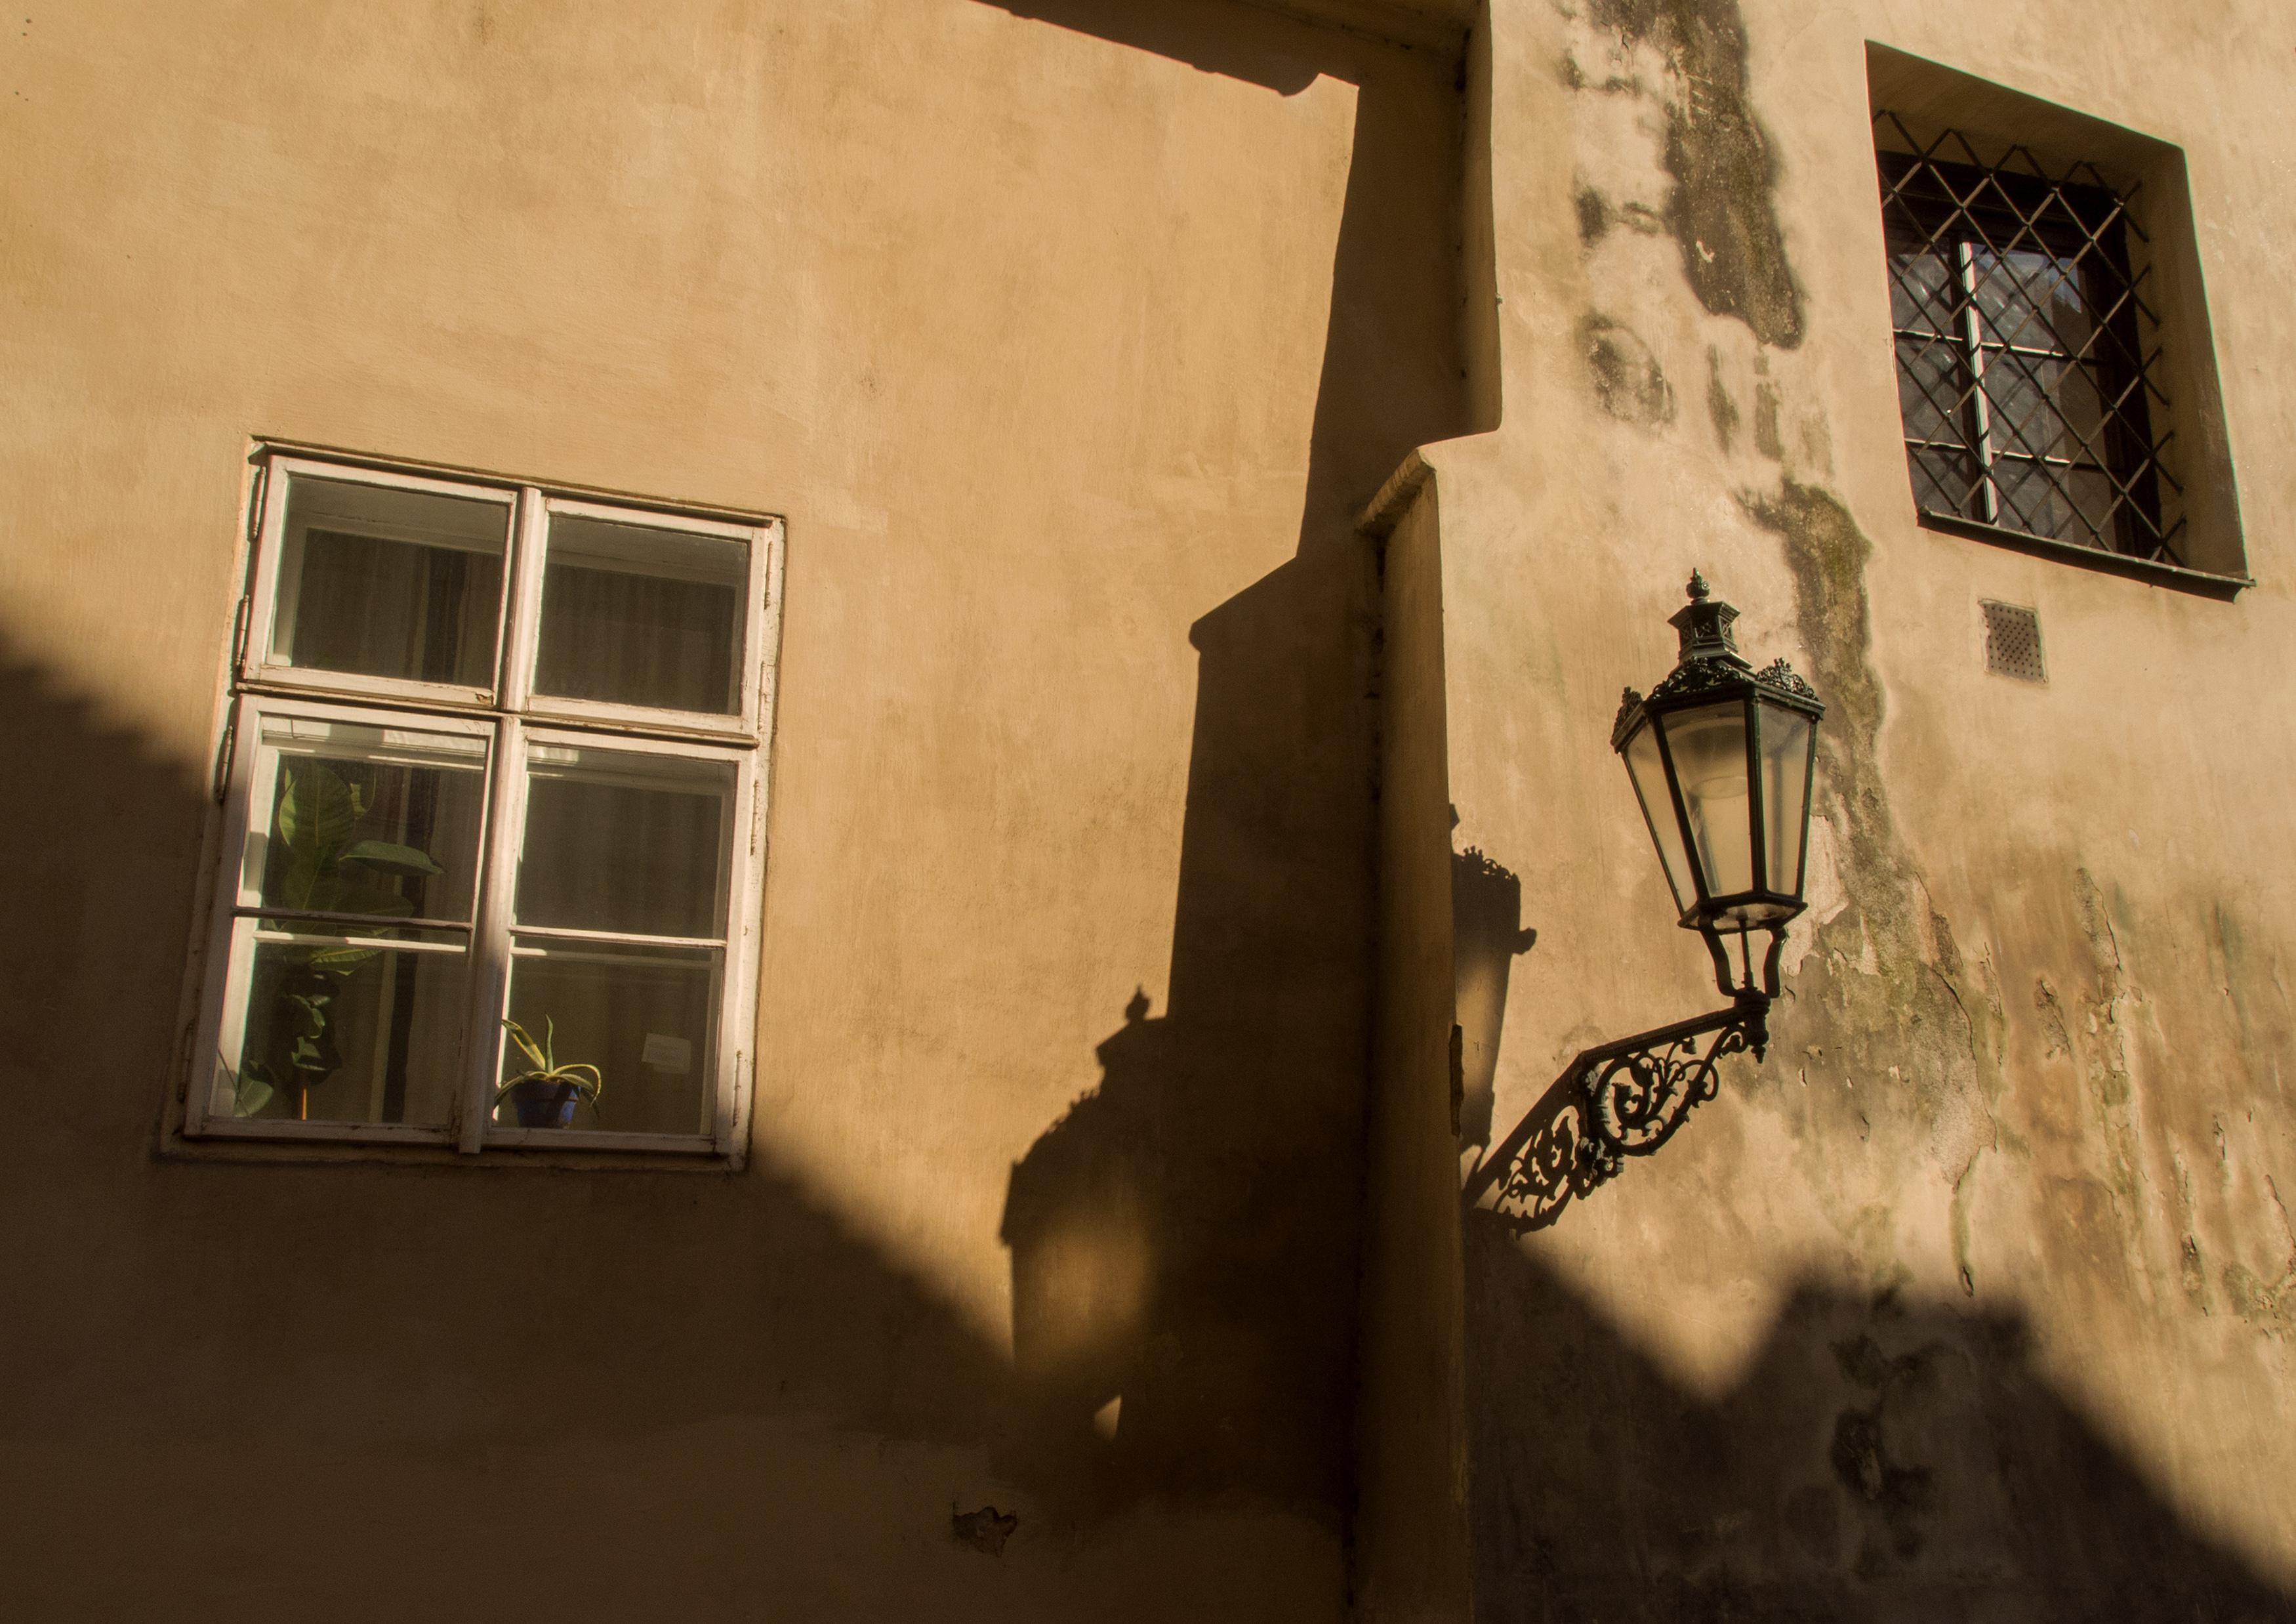 FREE IMAGE: Prague Street Lamp - Libreshot Public Domain Photos